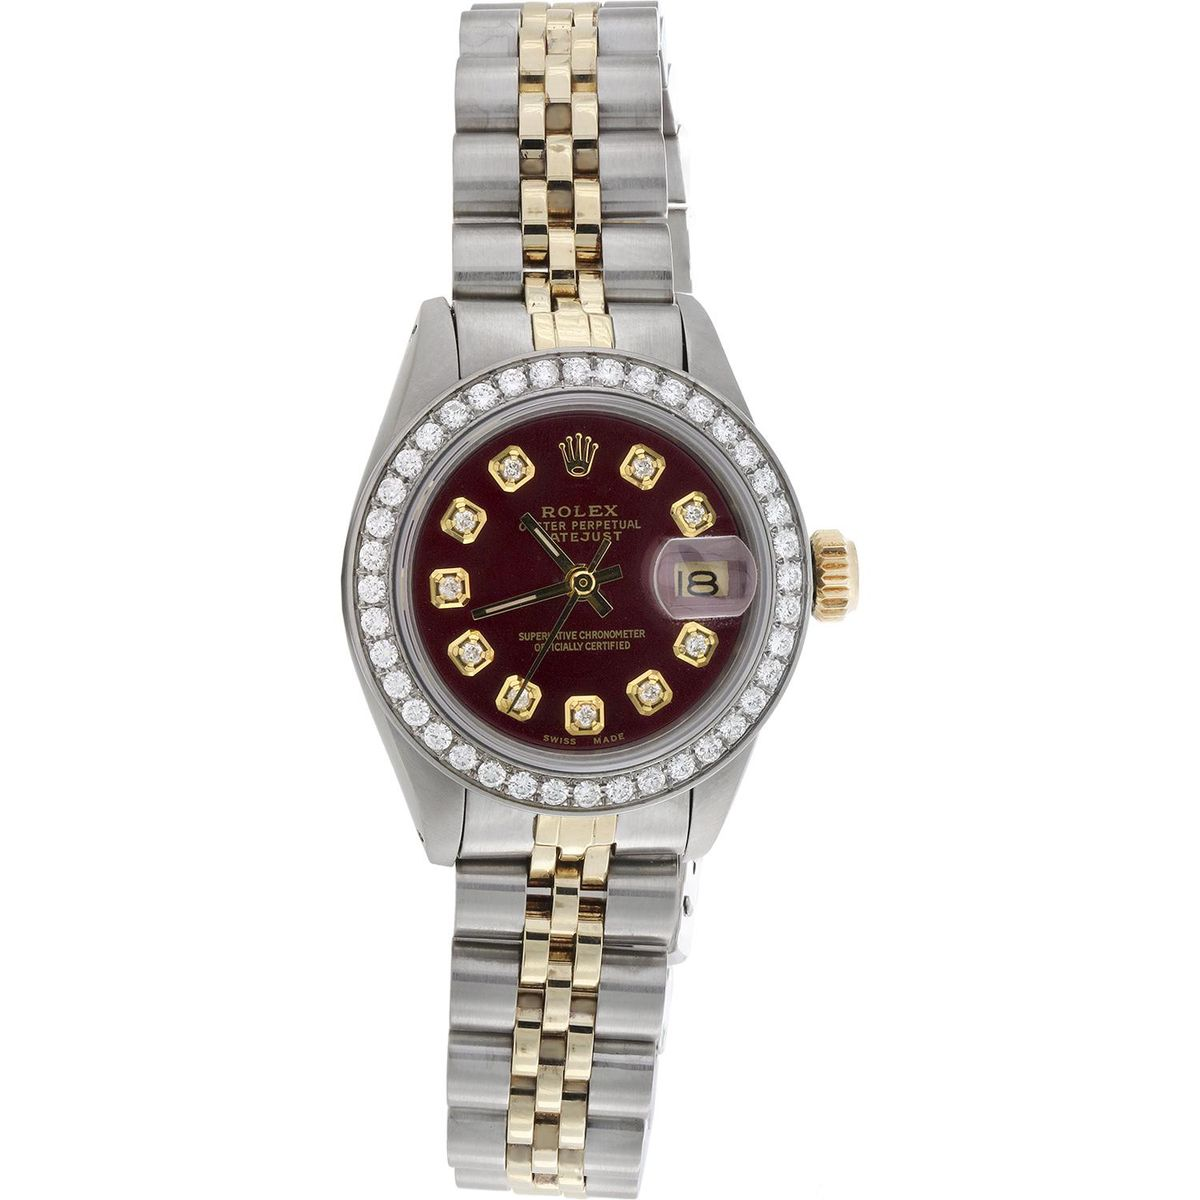 rolex ladies 6917 datejust jubilee 18k gold steel diamond watch red dial